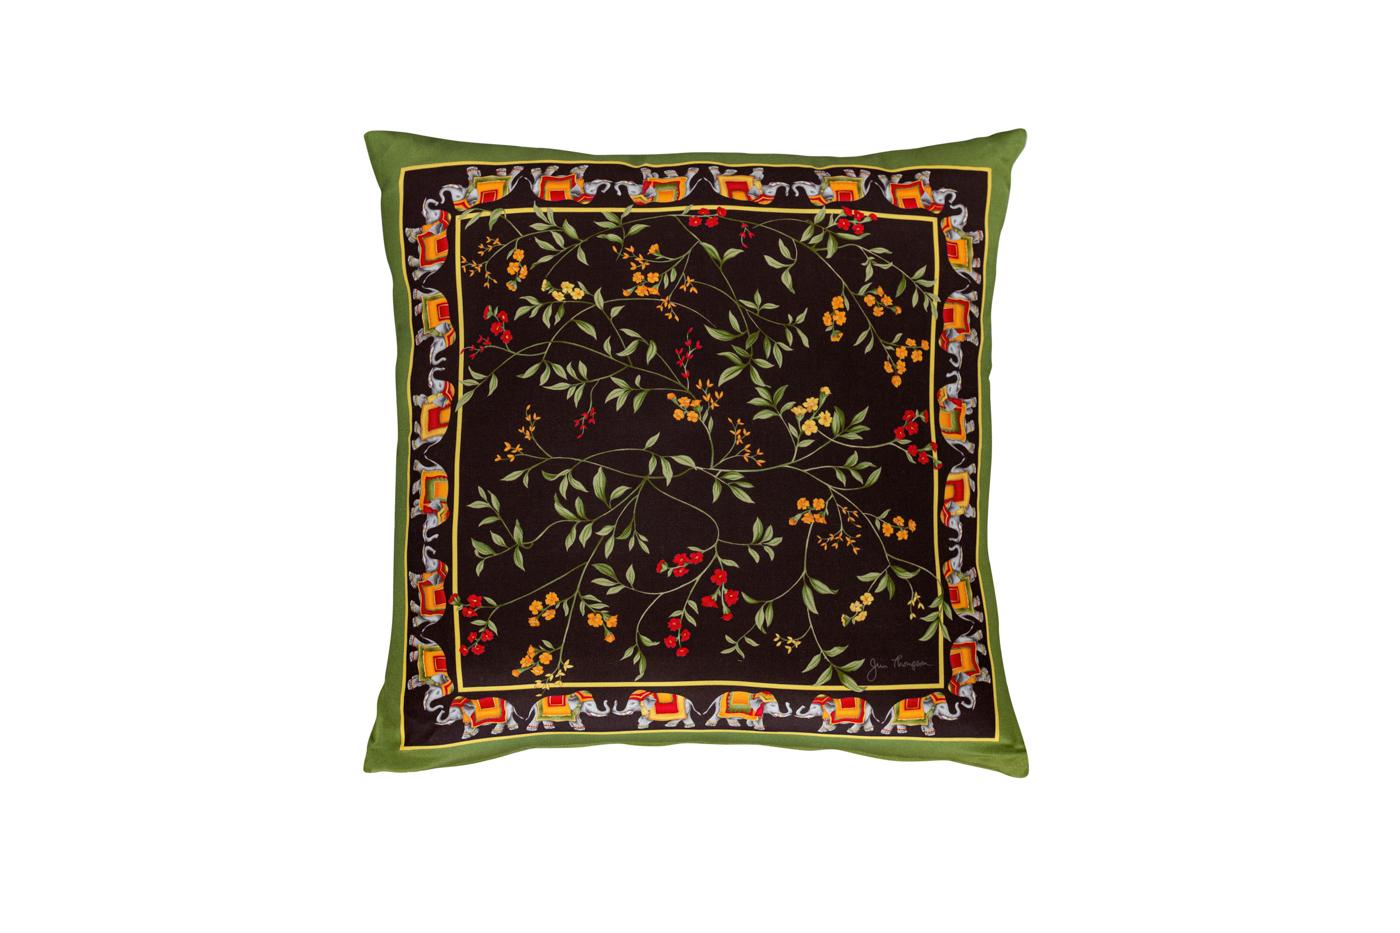 Cojín de seda Jim Thompson Floral con bordes de elefantes